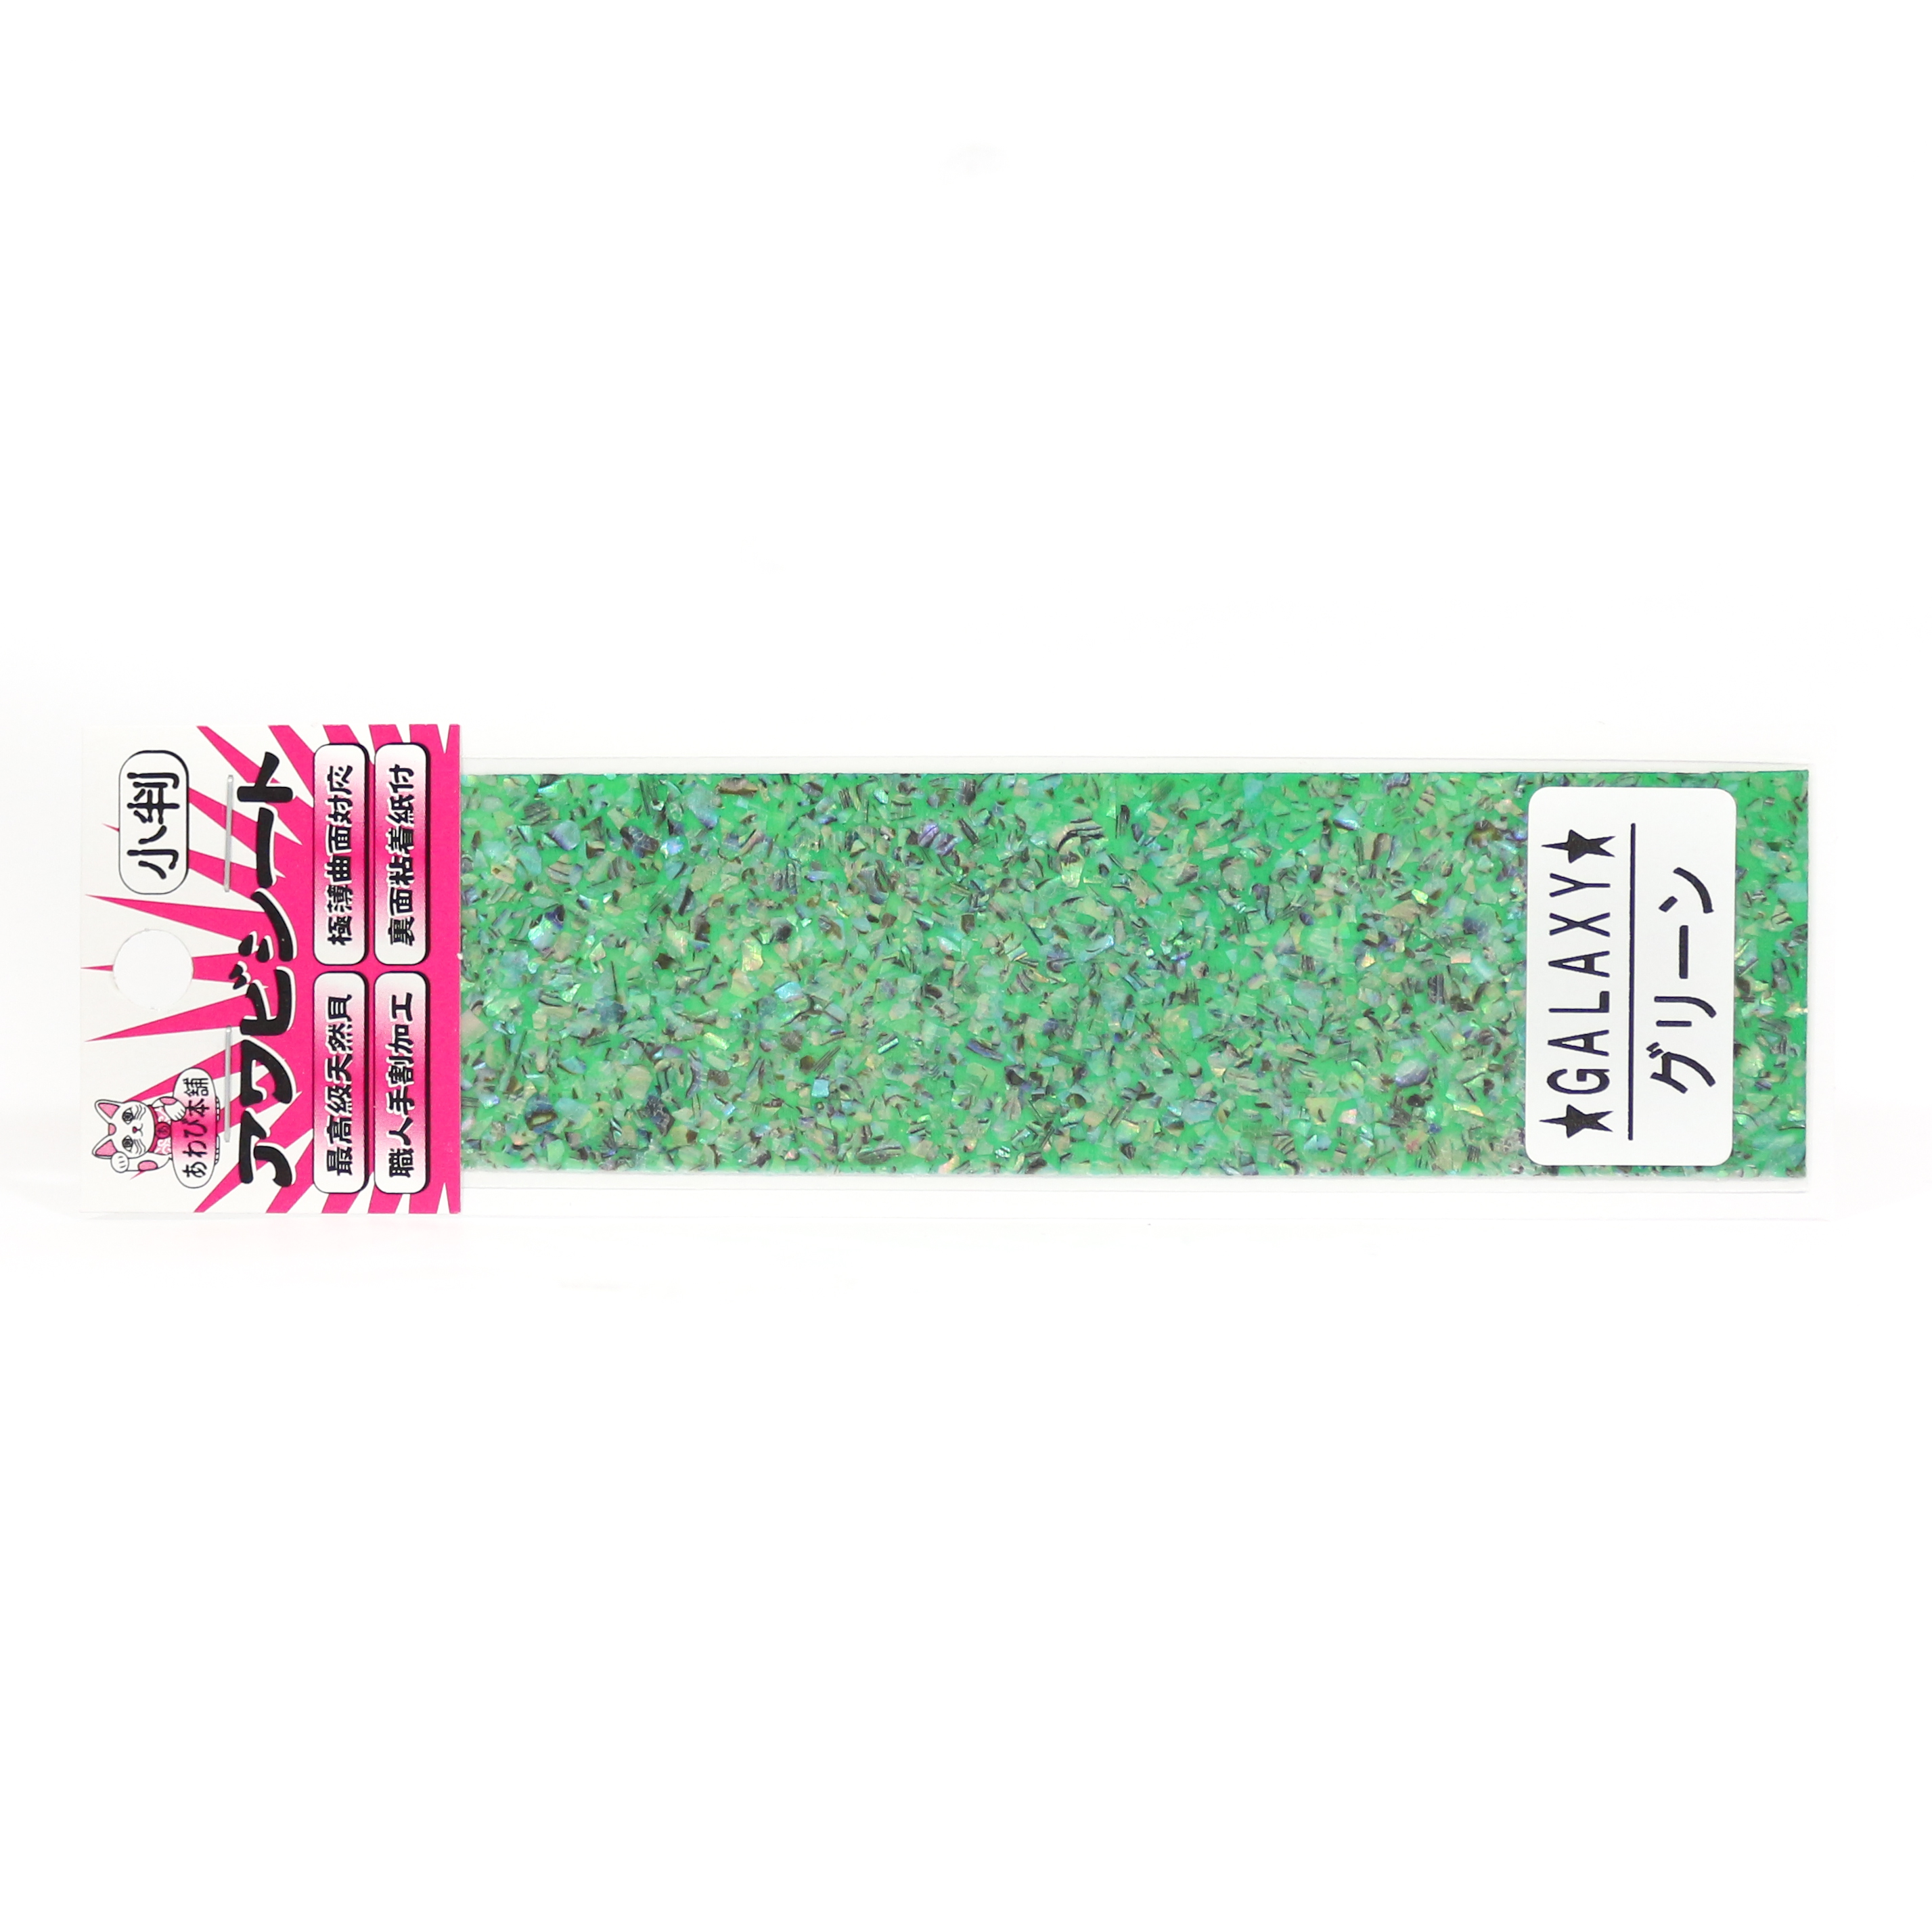 Sale Awabi Honpo Awabi Sheet Galaxy Size S 40 x 140 mm Green (2446)